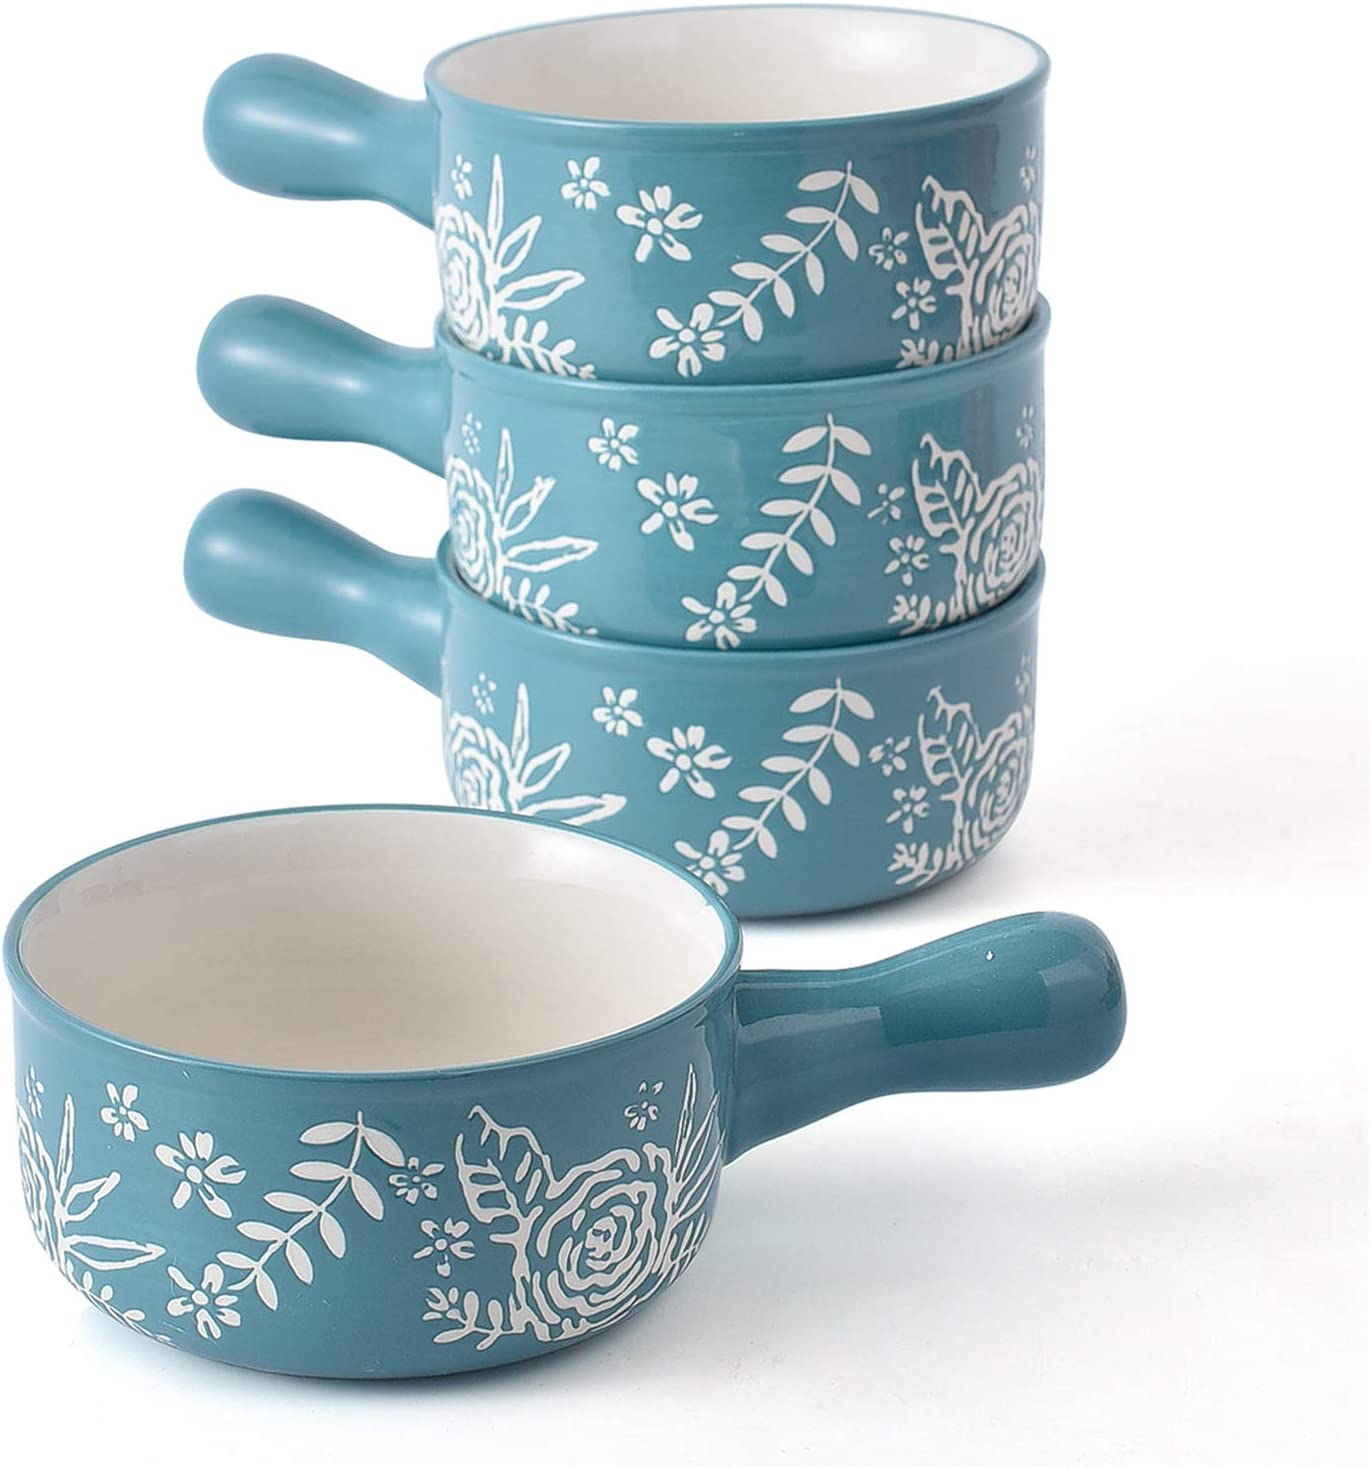 KINGSBULL HOME Soup Bowls with Handles Soup Bowls Ceramic Soup Bowl Soup Mug French Onion Soup Crocks Oven Safe